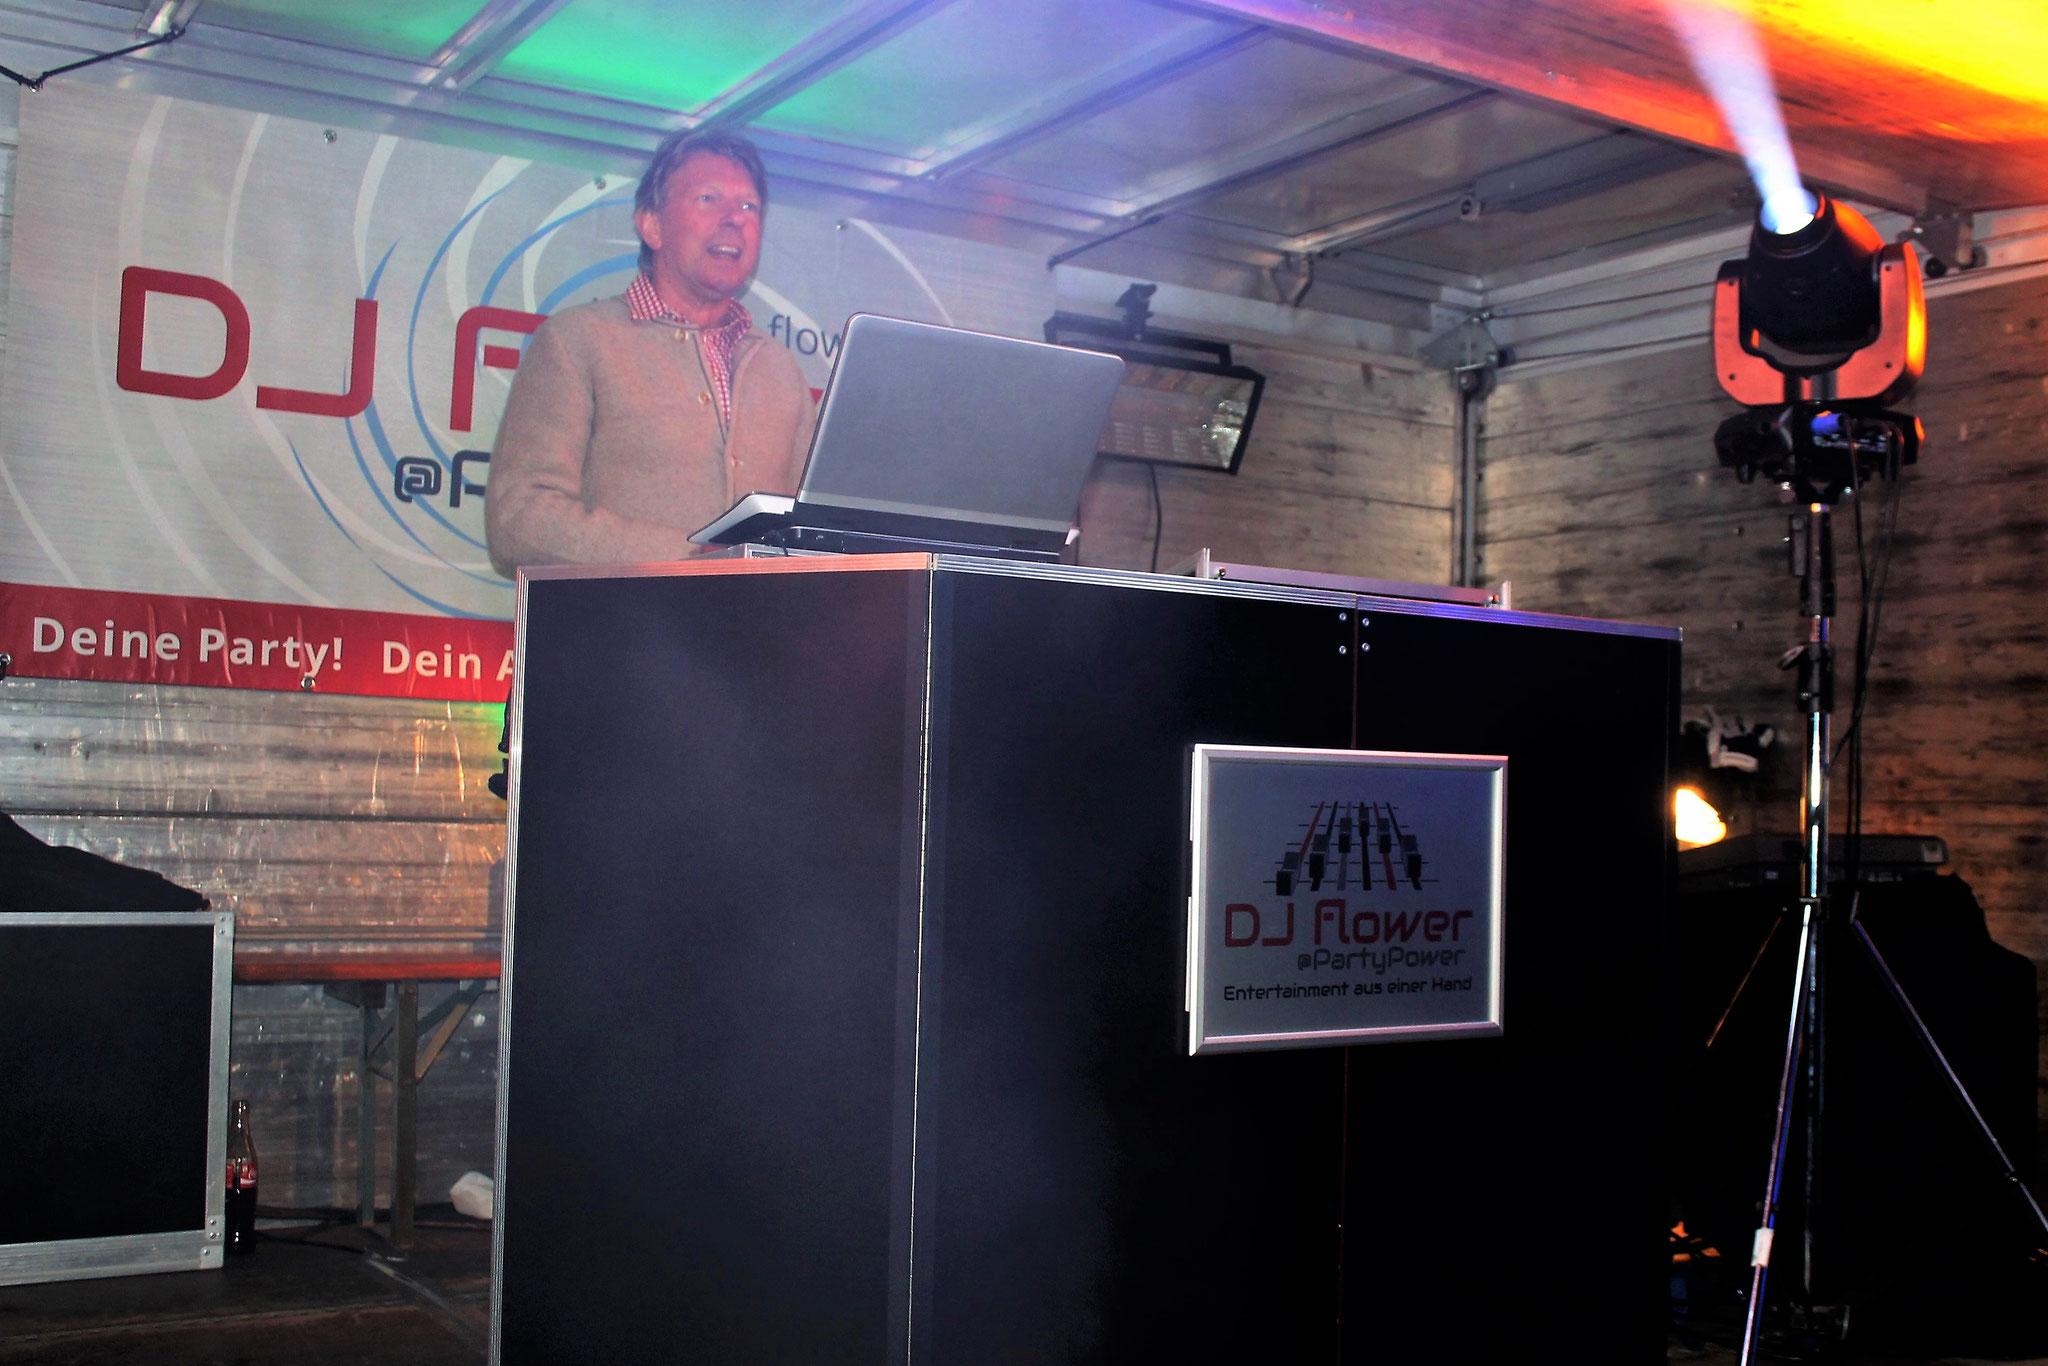 DJ Flower & Skylight Veranstaltungstechnik